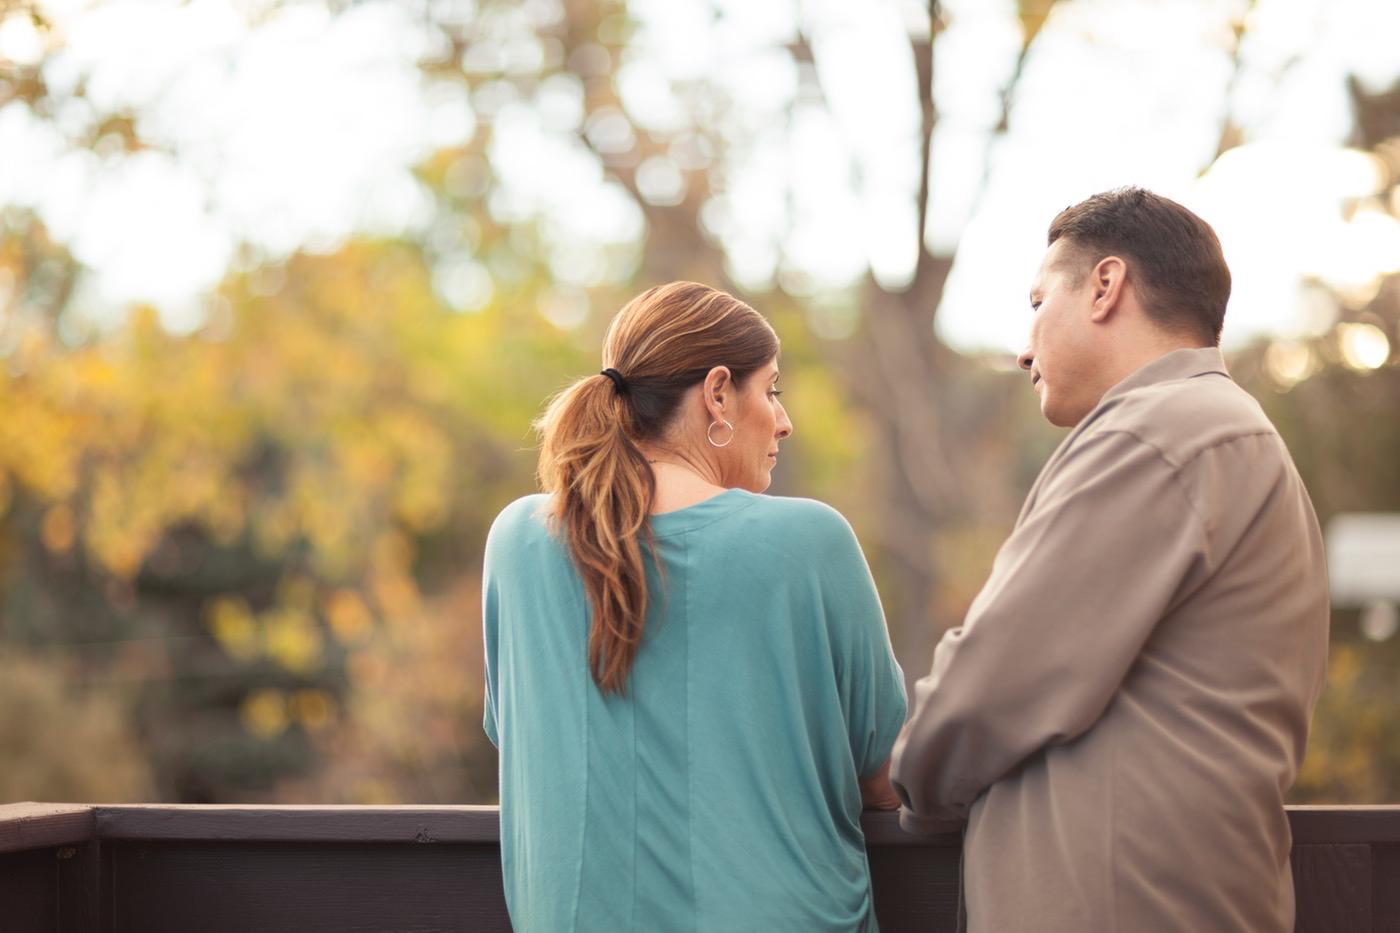 b8b20675c171d ما لا يعرفه الكثير من الأزواج أنه كلما كانت العلاقة الجنسية بين الأزواج  منتظمة وصحية وتُتشعر كلا الطرفين بالرضا كلما ازداد الشعور بالاستقرار النفسي  والعاطفي ...